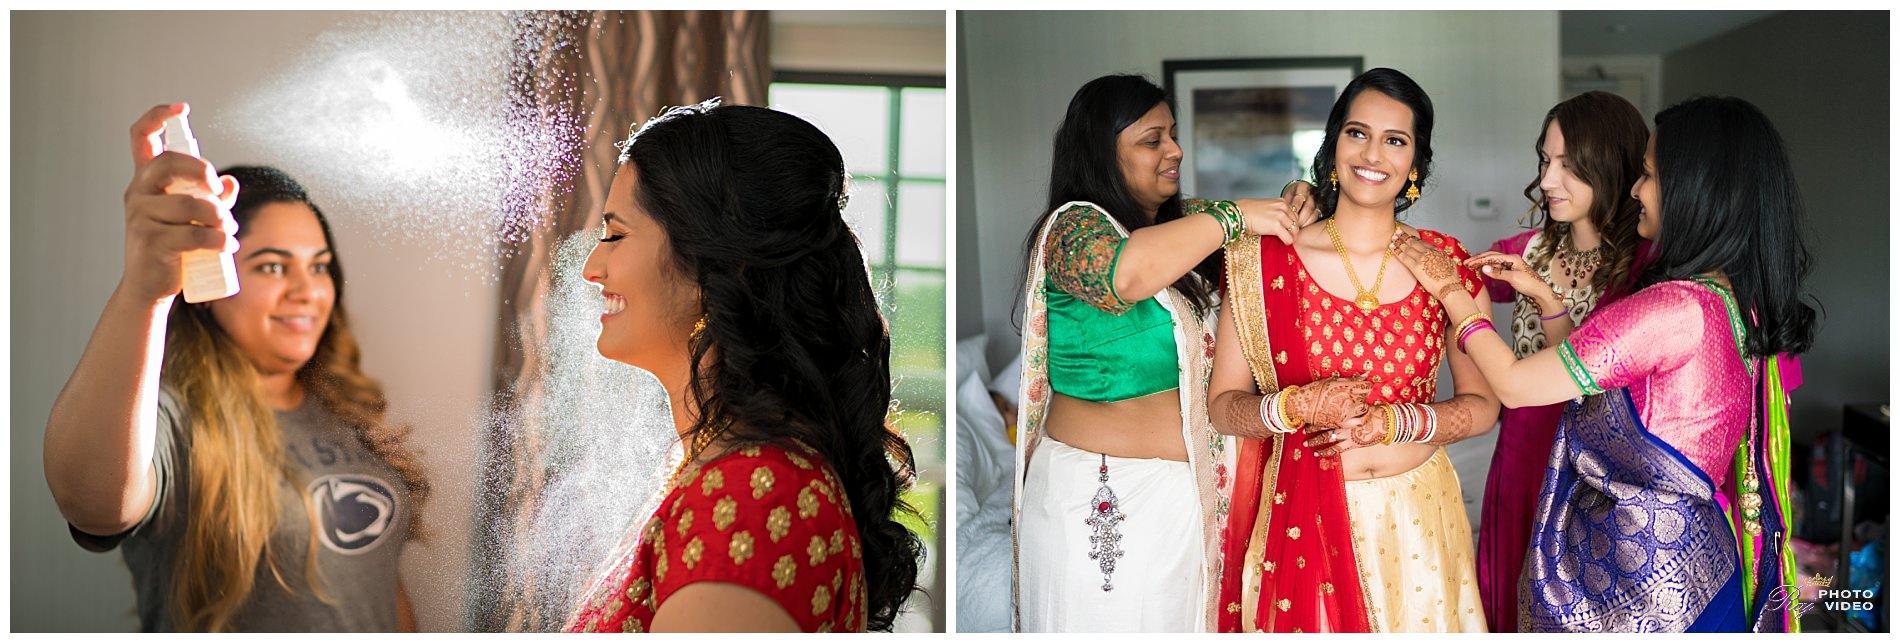 Martinsville-Gardens-NJ-Indian-Wedding-Ruchi-Vishal-4.jpg